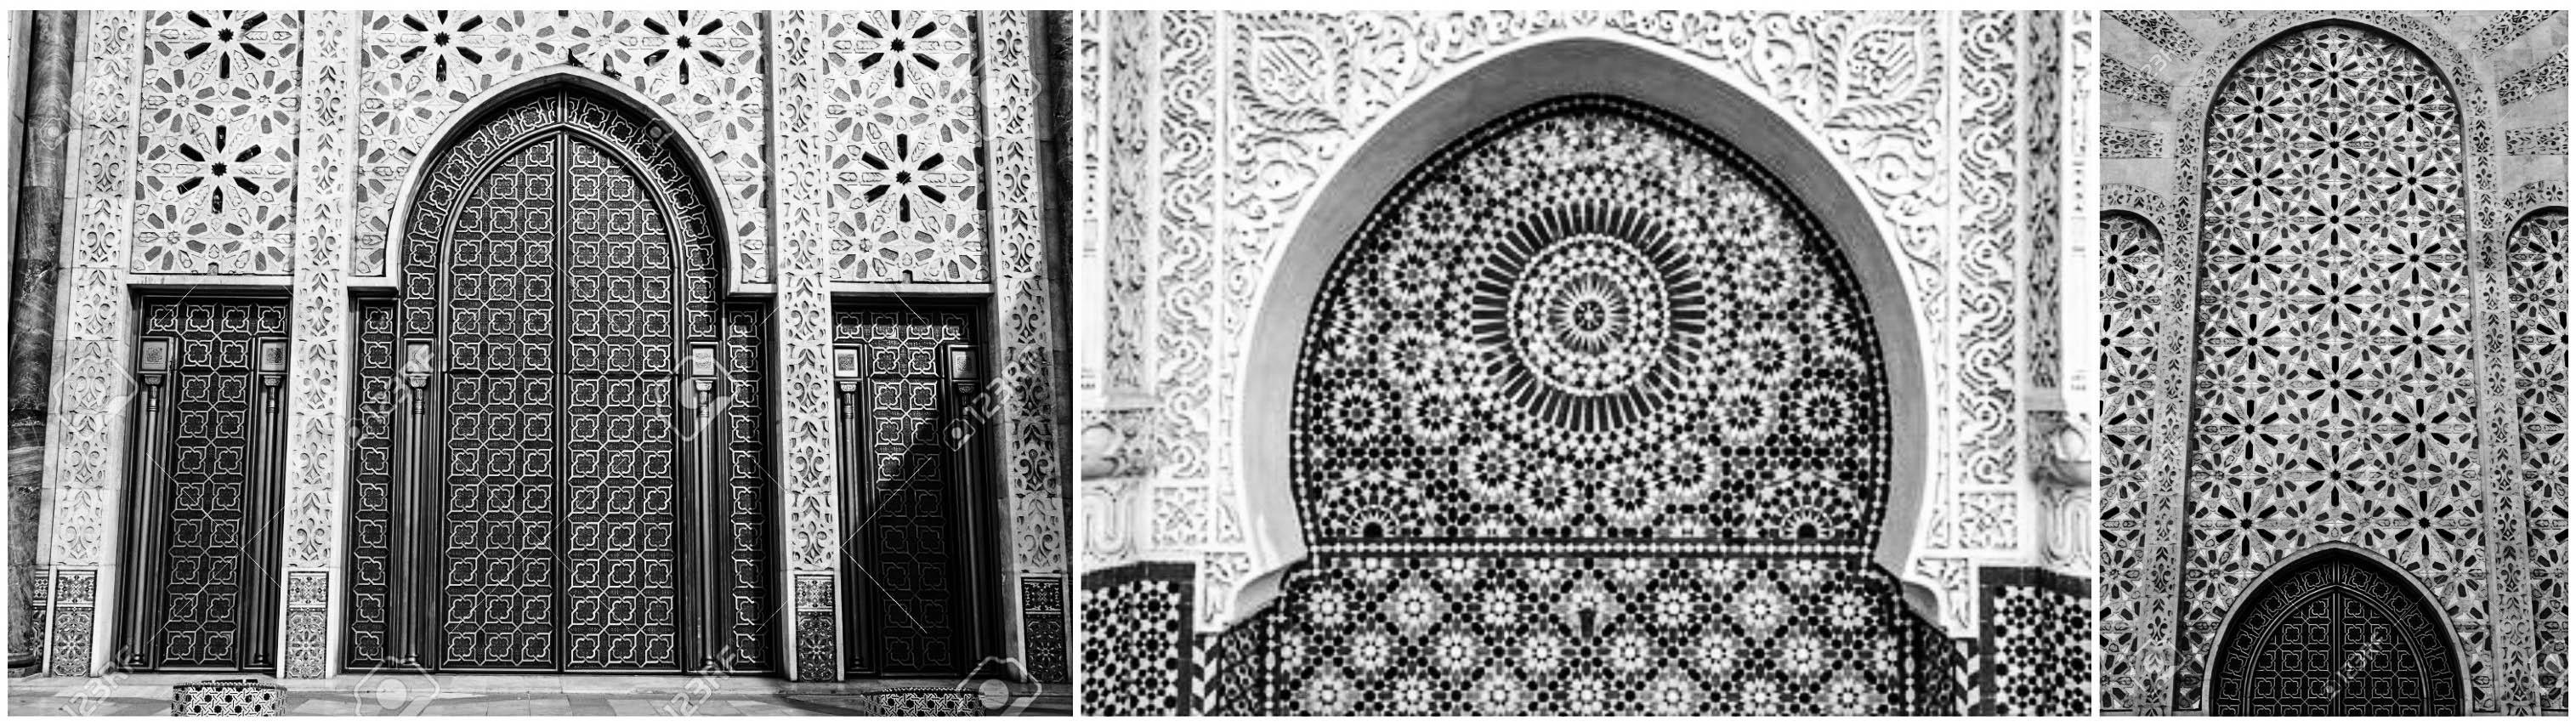 ornamen masjid geometris